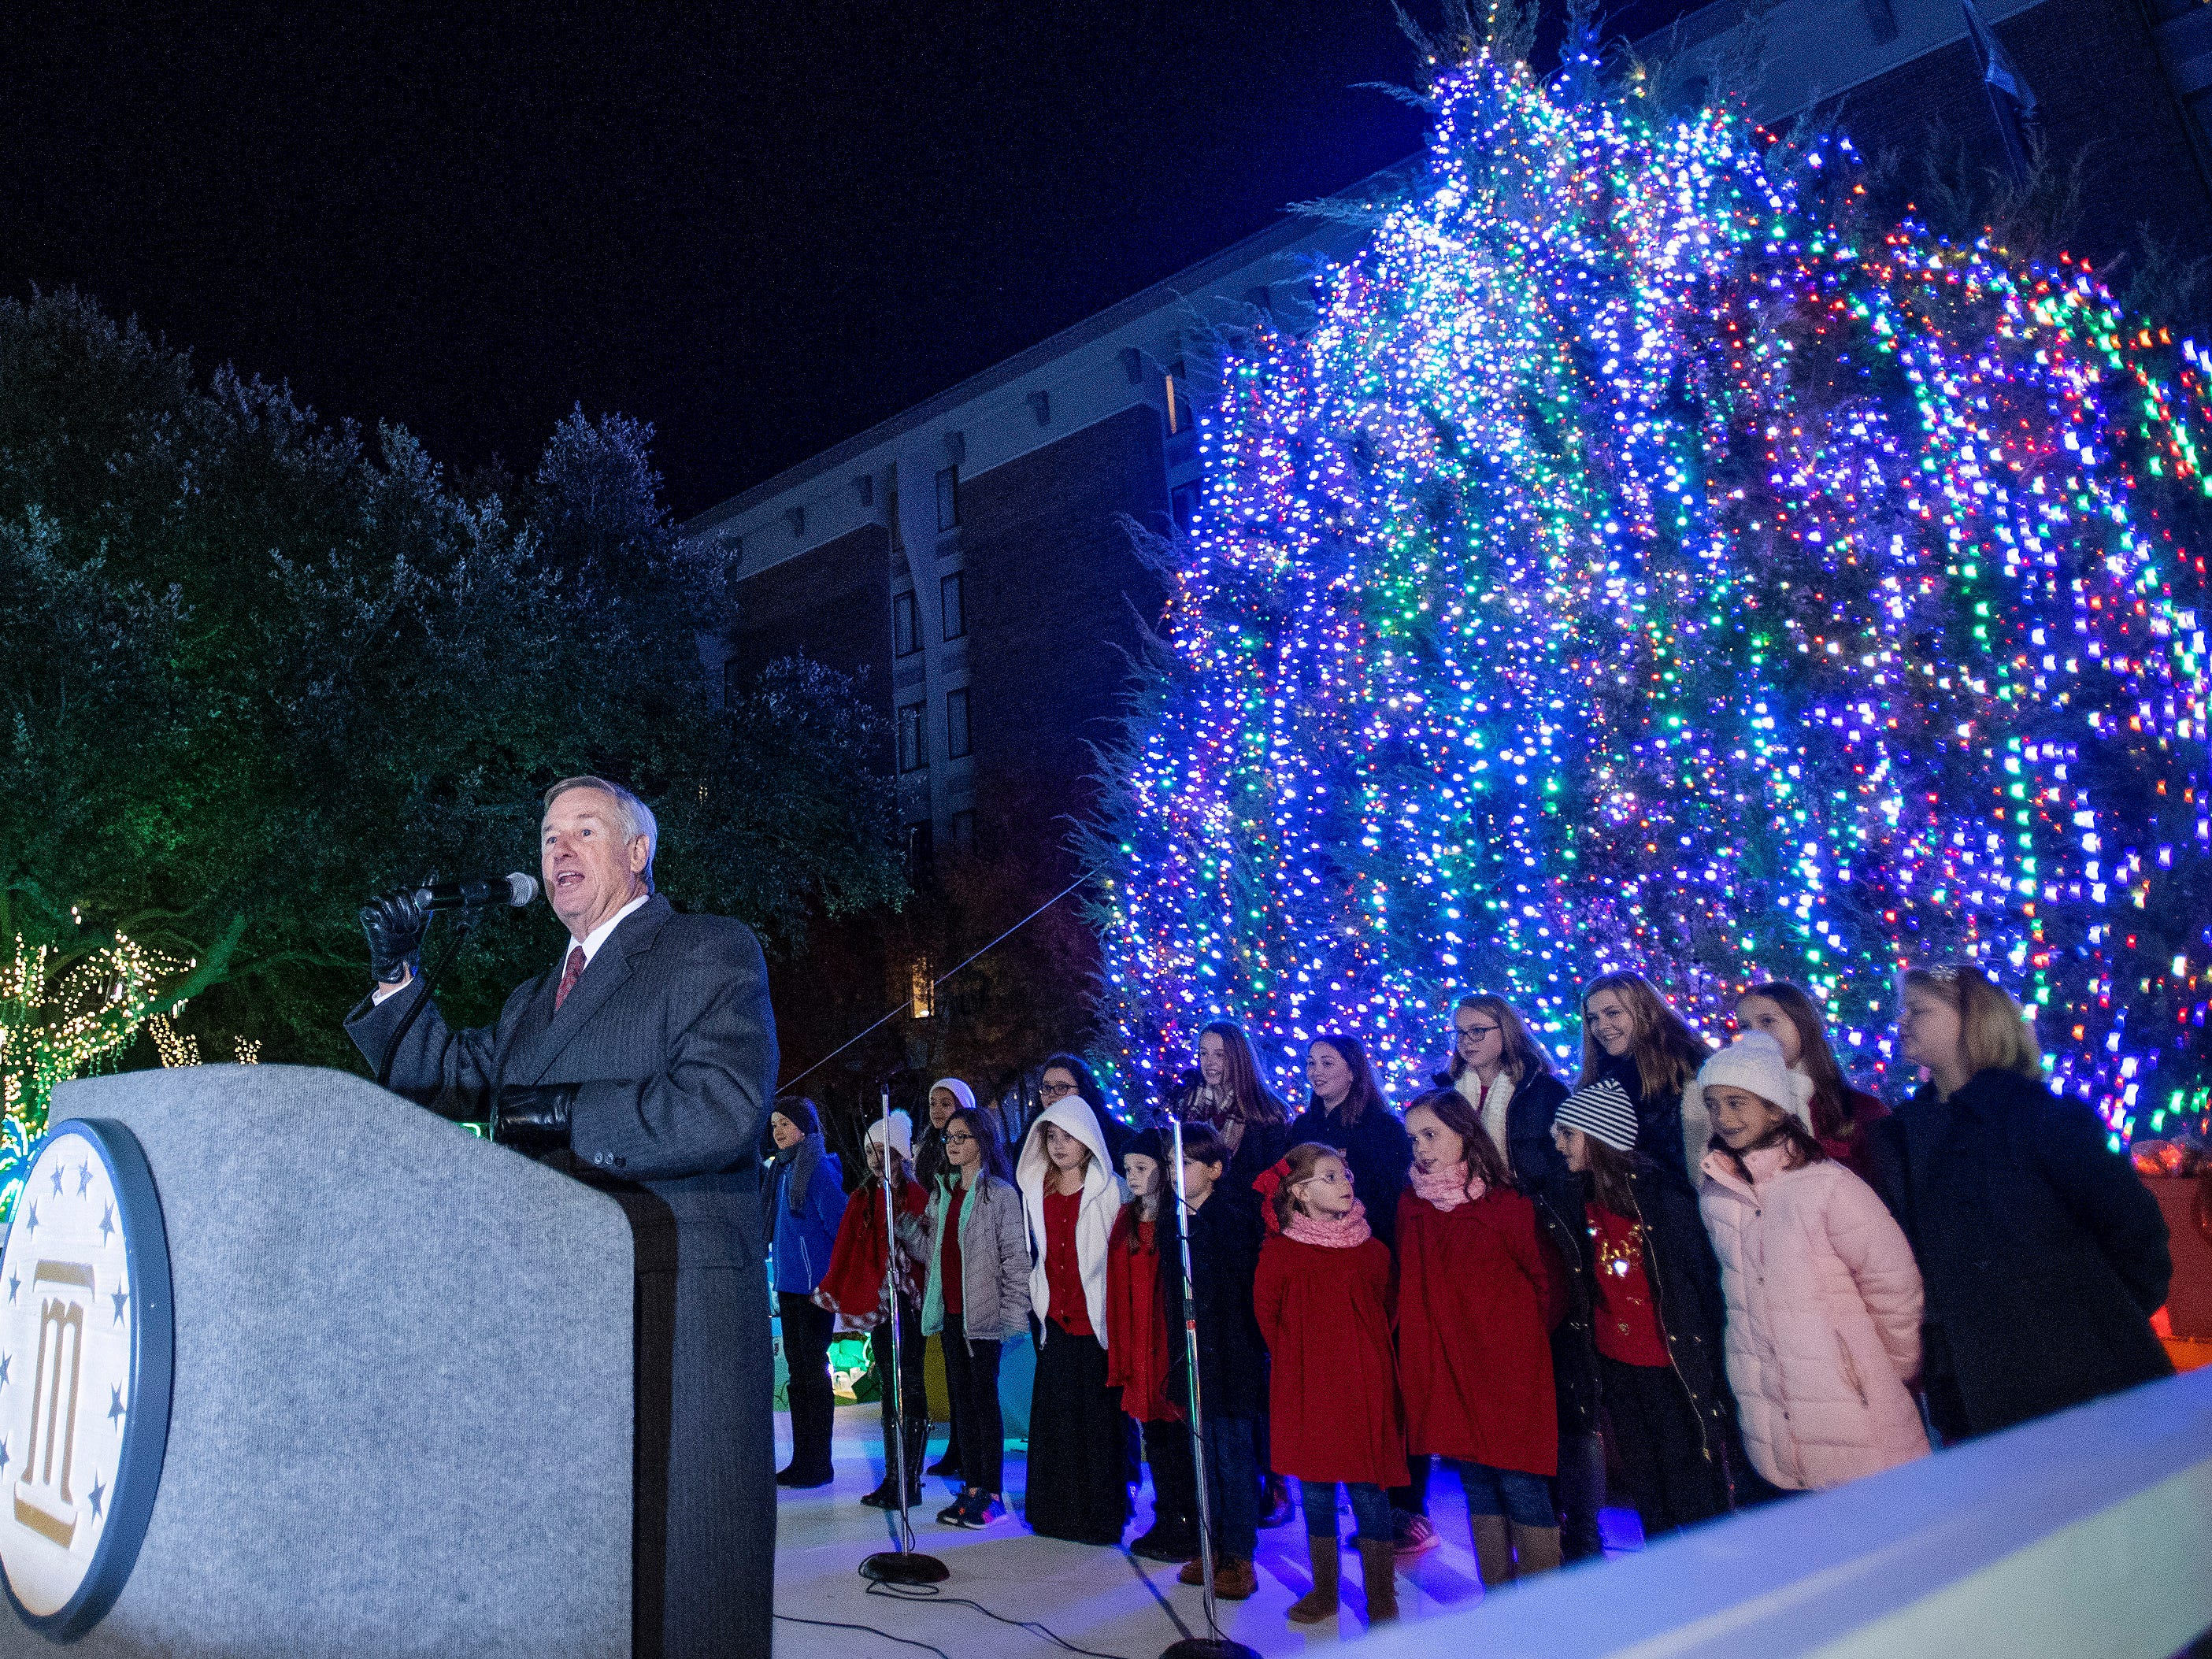 Montgomery Mayor Todd Strange speaks during the City of Montgomery Christmas Tree lighting in Montgomery, Ala., on Tuesday evening November 27, 2018.